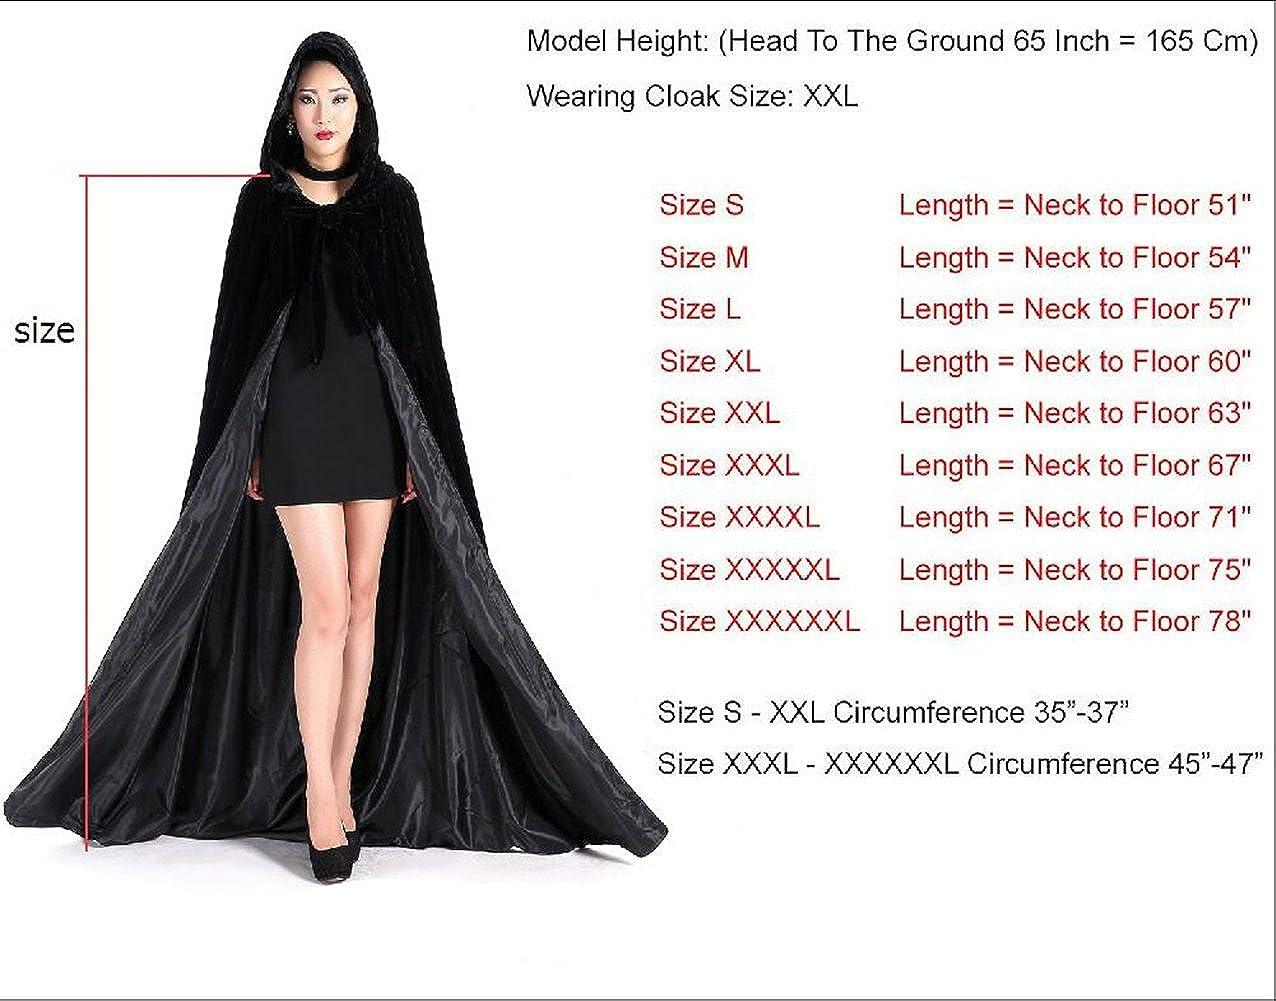 Newdeve Halloween Hooded Cloak Medieval Wedding Cape Black Robe Cosplay